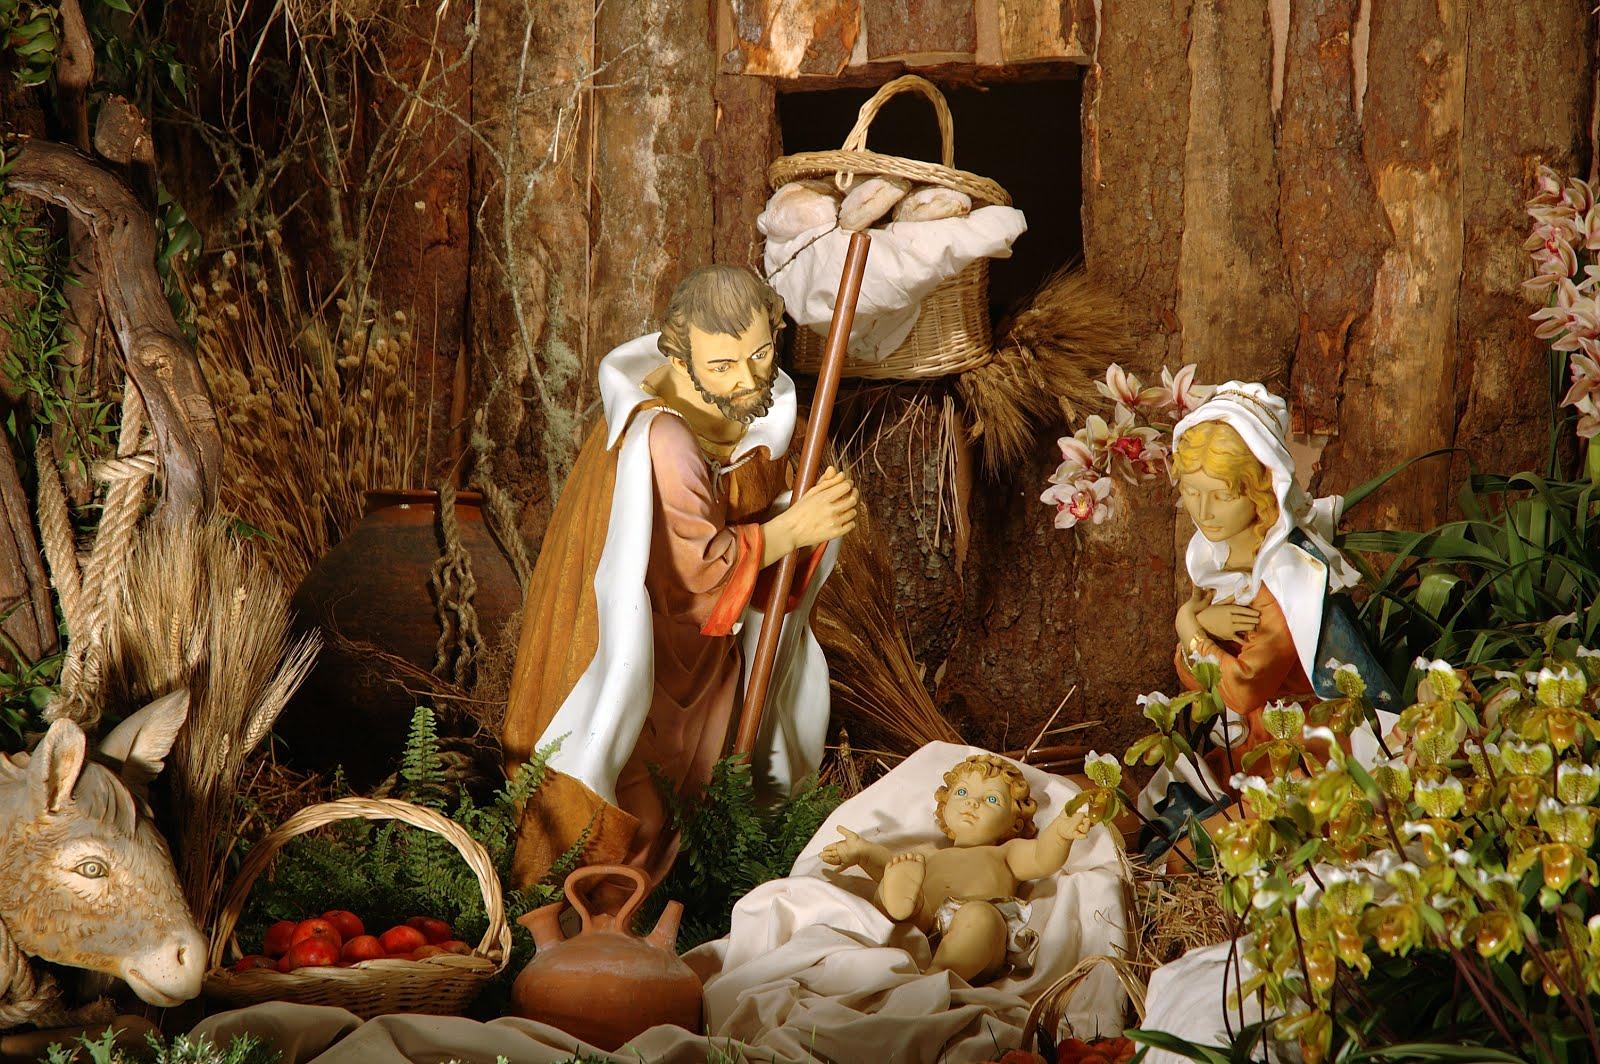 1000+ images about Nacimientos on Pinterest | Navidad ...